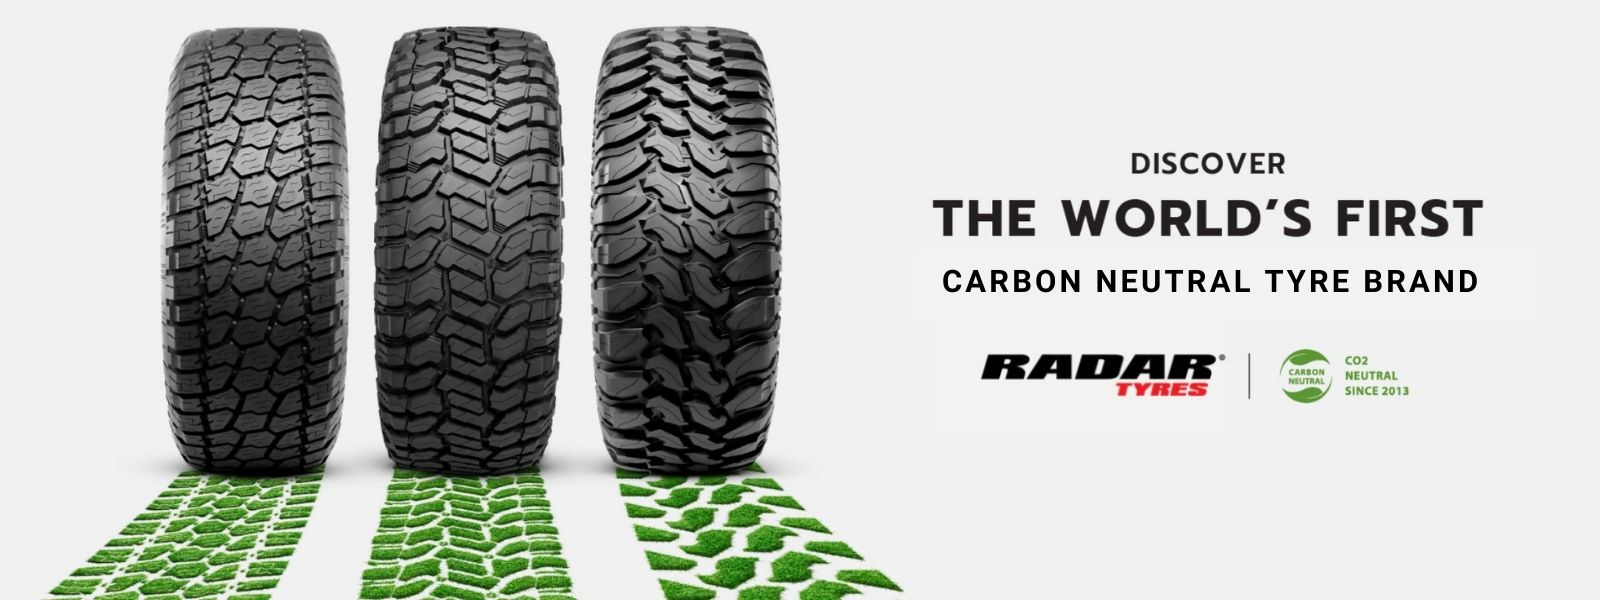 Radar tyres carbon neutral banner